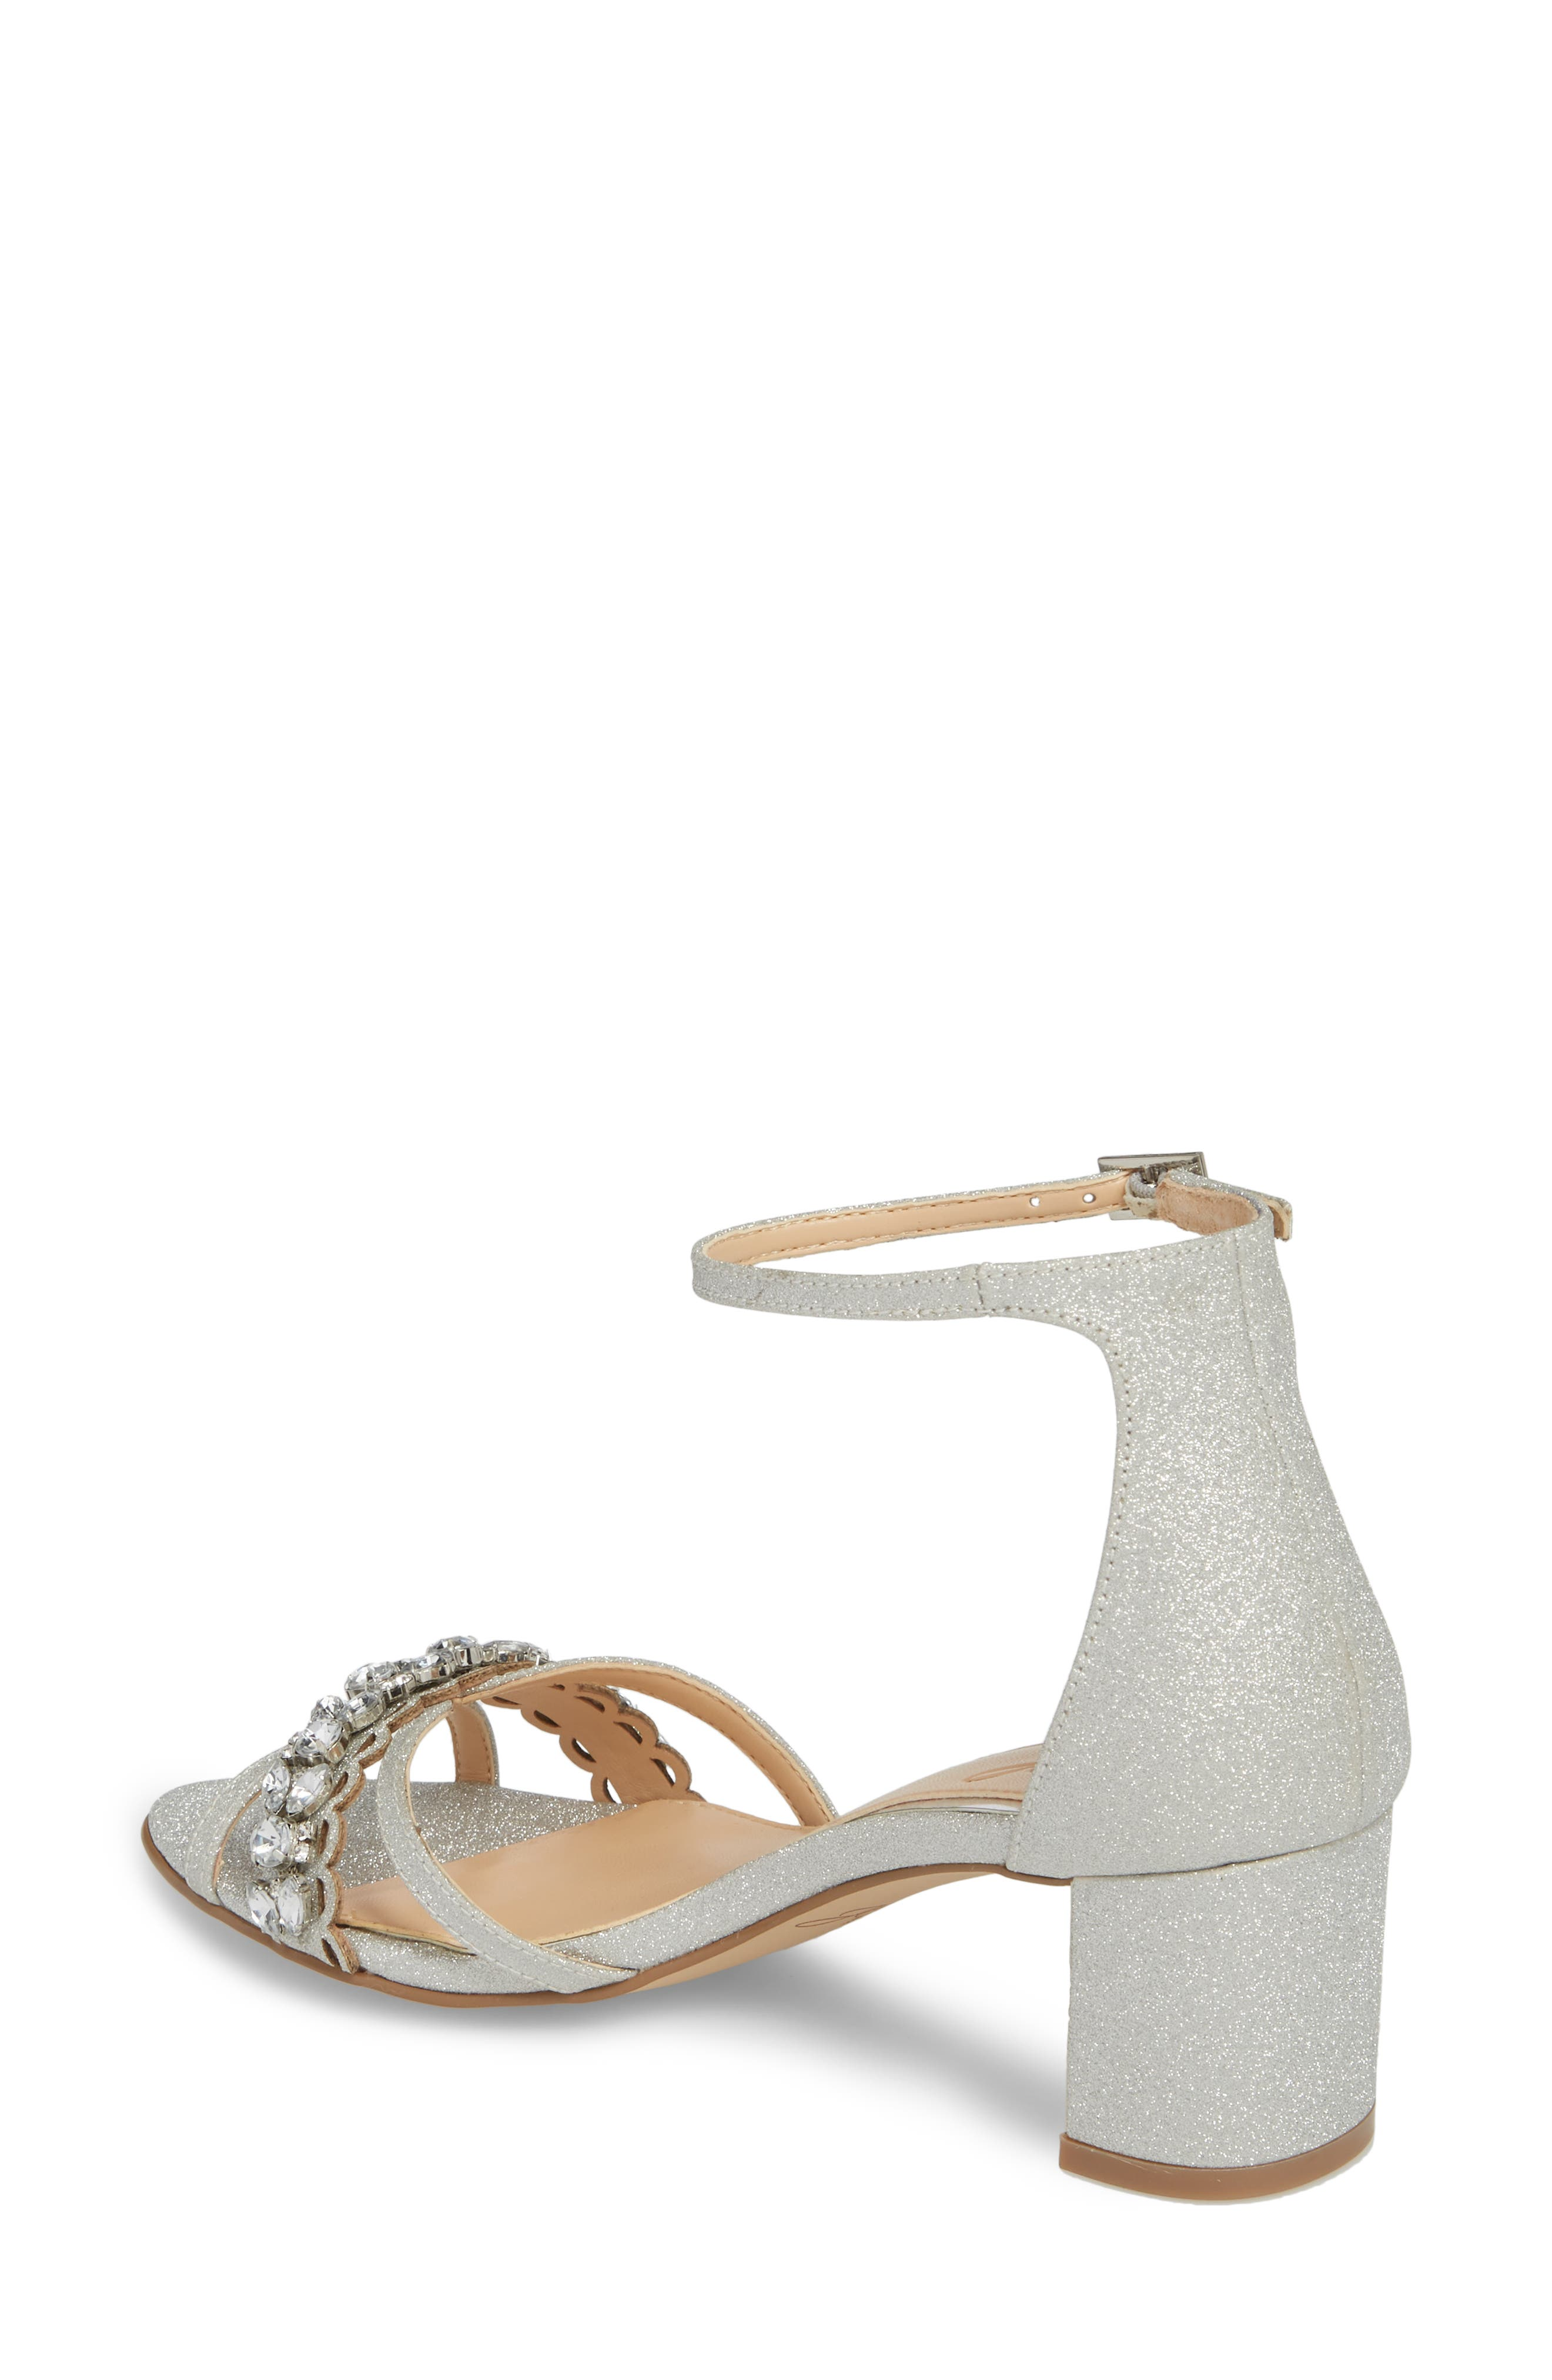 Giona Sandal,                             Alternate thumbnail 2, color,                             Silver Glitter Fabric